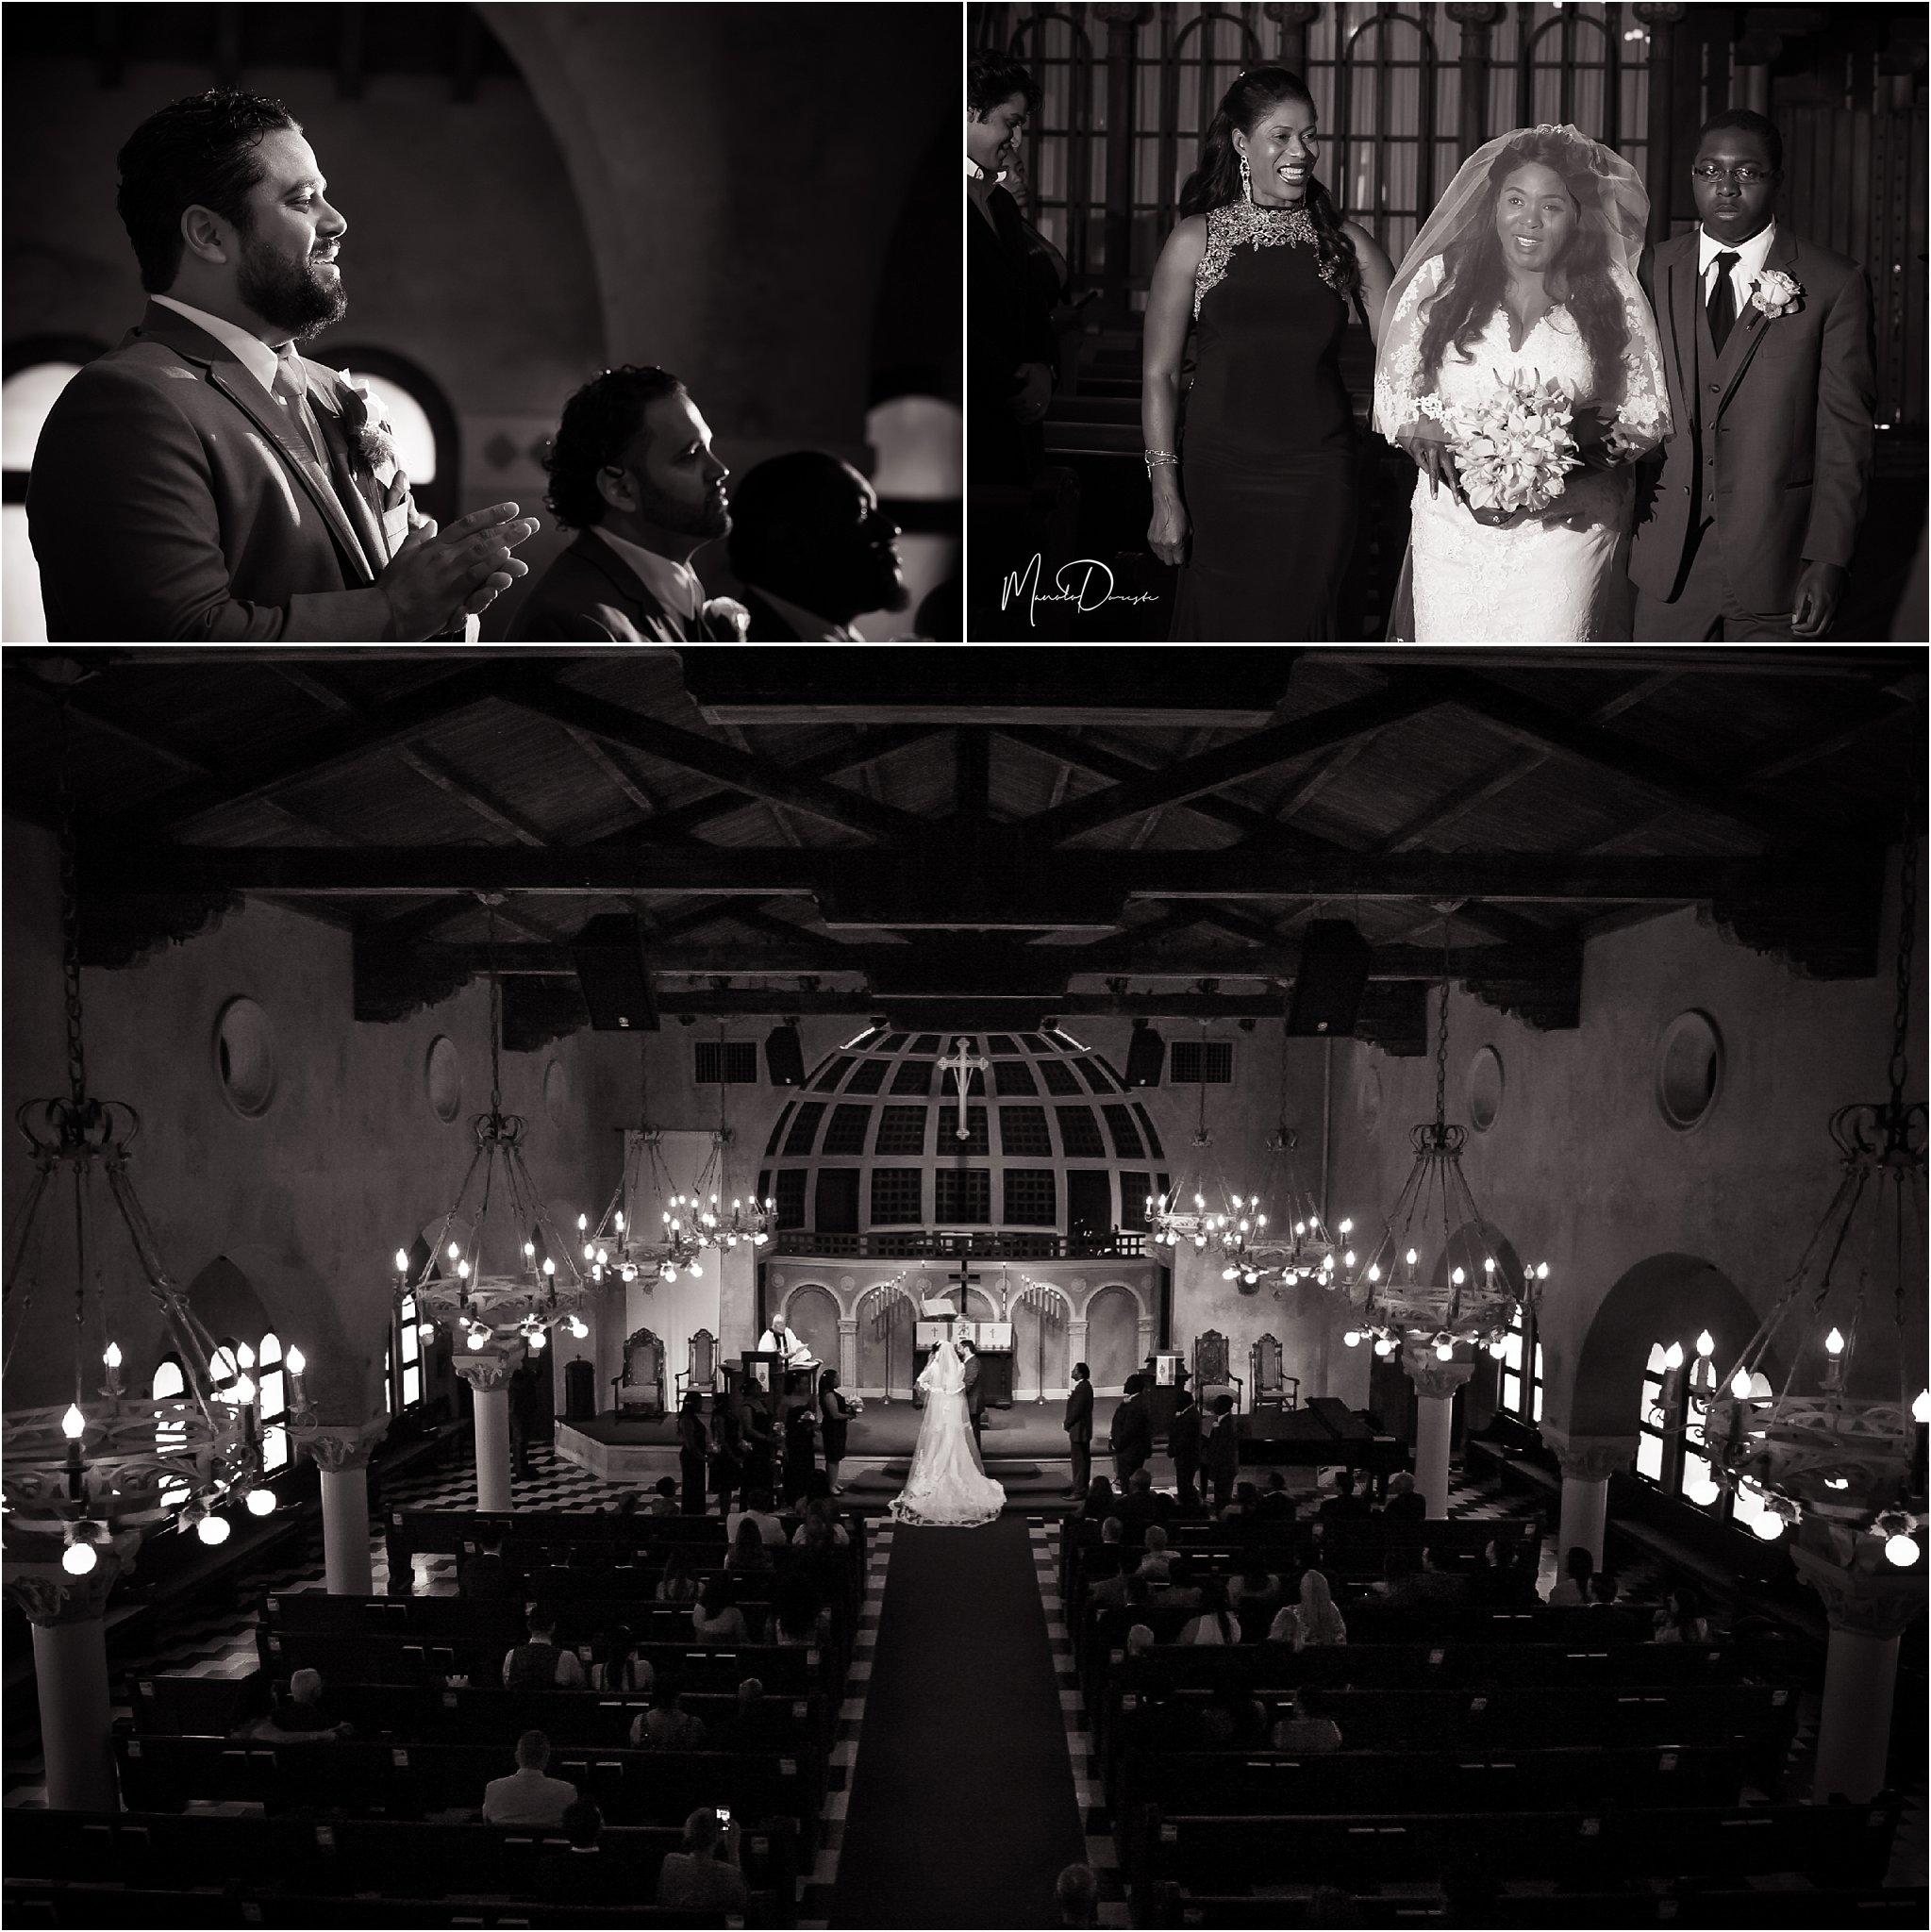 0421_ManoloDoreste_InFocusStudios_Wedding_Family_Photography_Miami_MiamiPhotographer.jpg